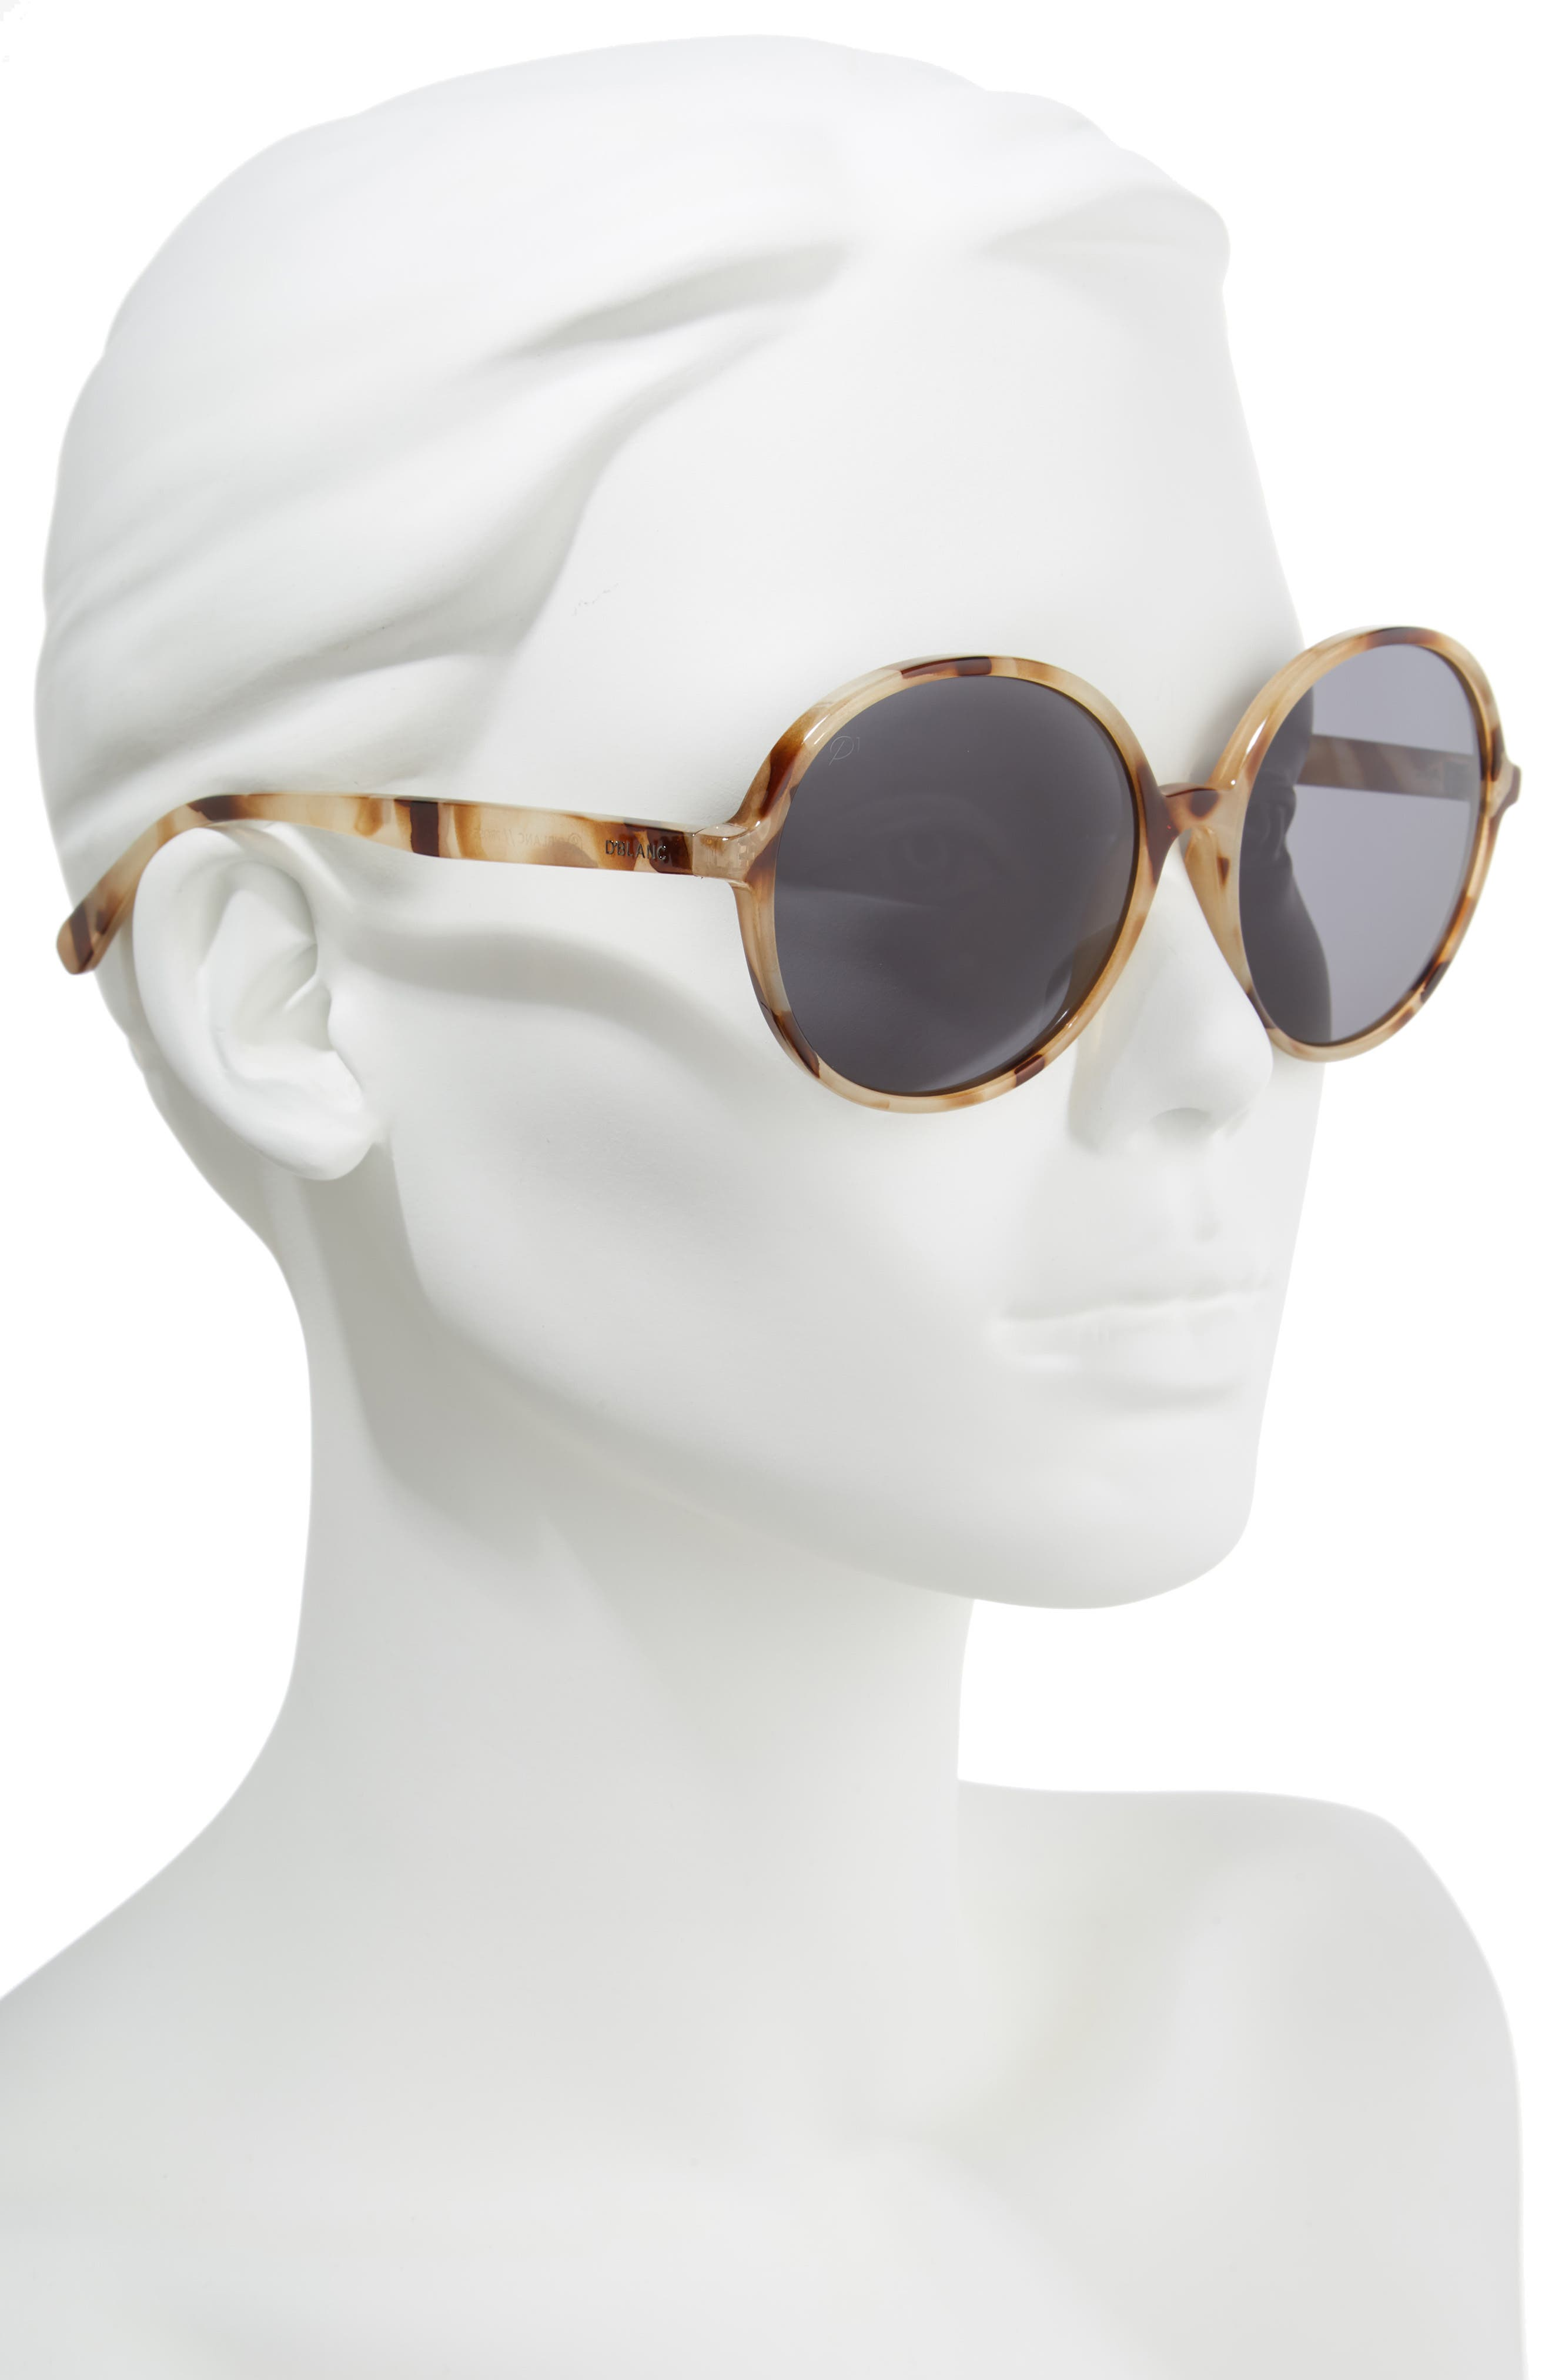 D'BLANC Prose 59mm Round Sunglasses,                             Alternate thumbnail 2, color,                             SNOW LEOPARD/ GREY POLAR